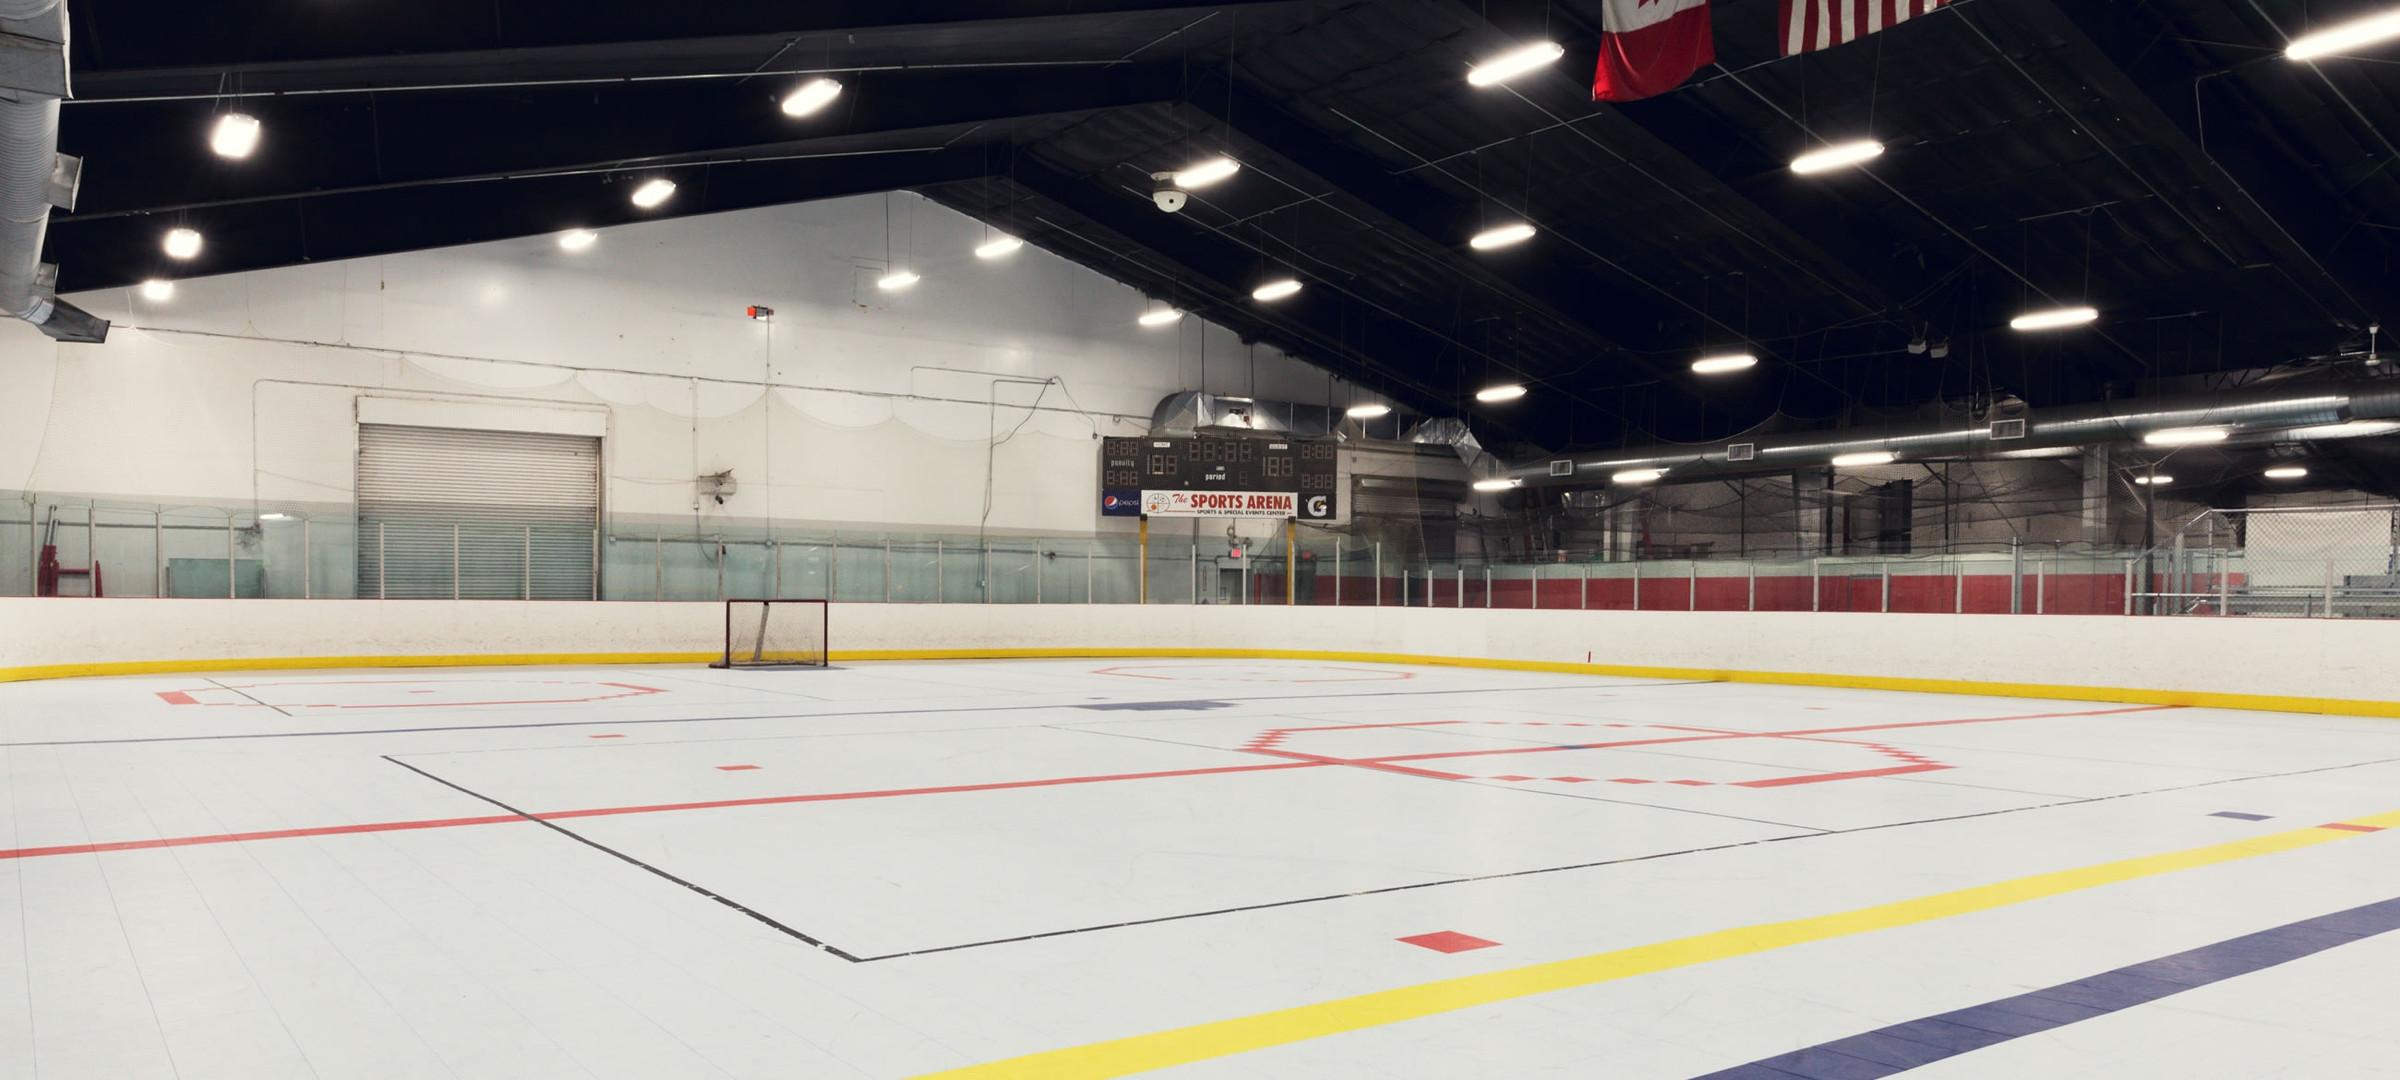 facilities-hockey-rink-06_2600_1170_s_c1